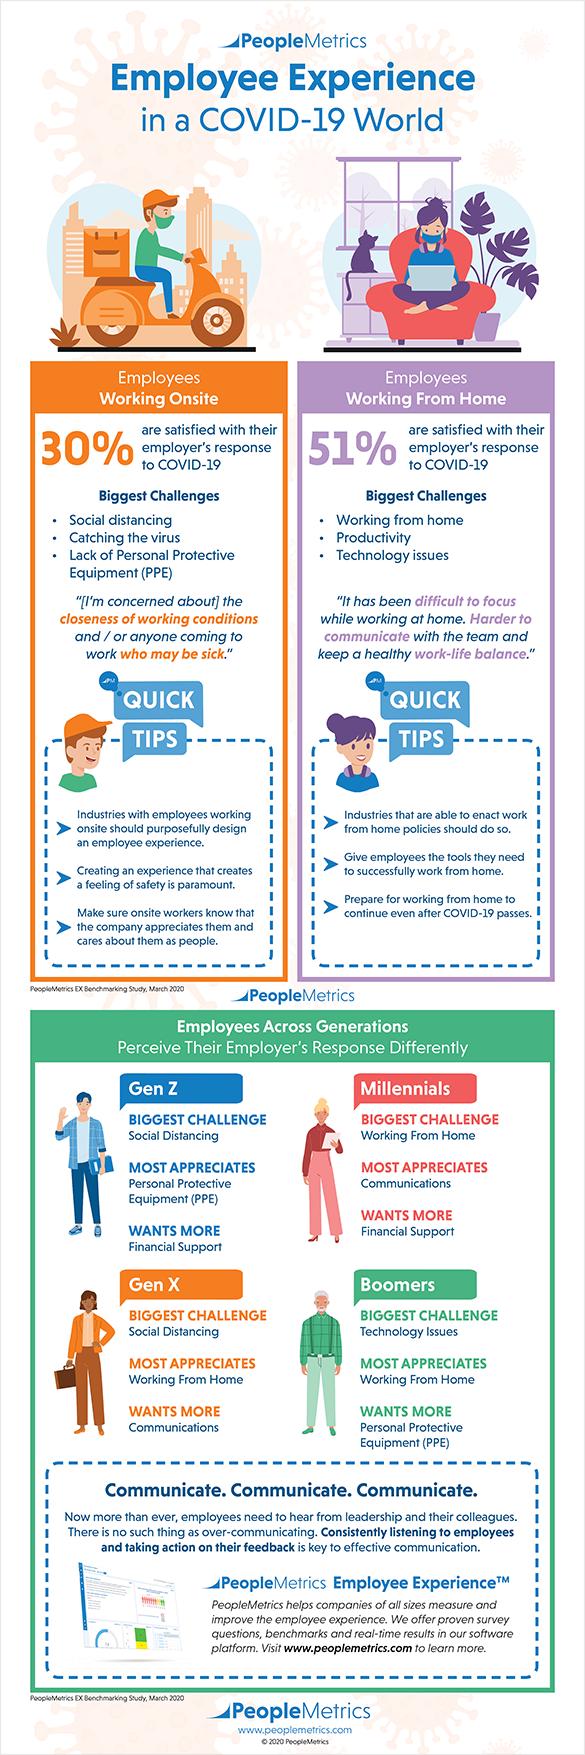 PeopleMetrics Infographic Employee Experience COVID-19